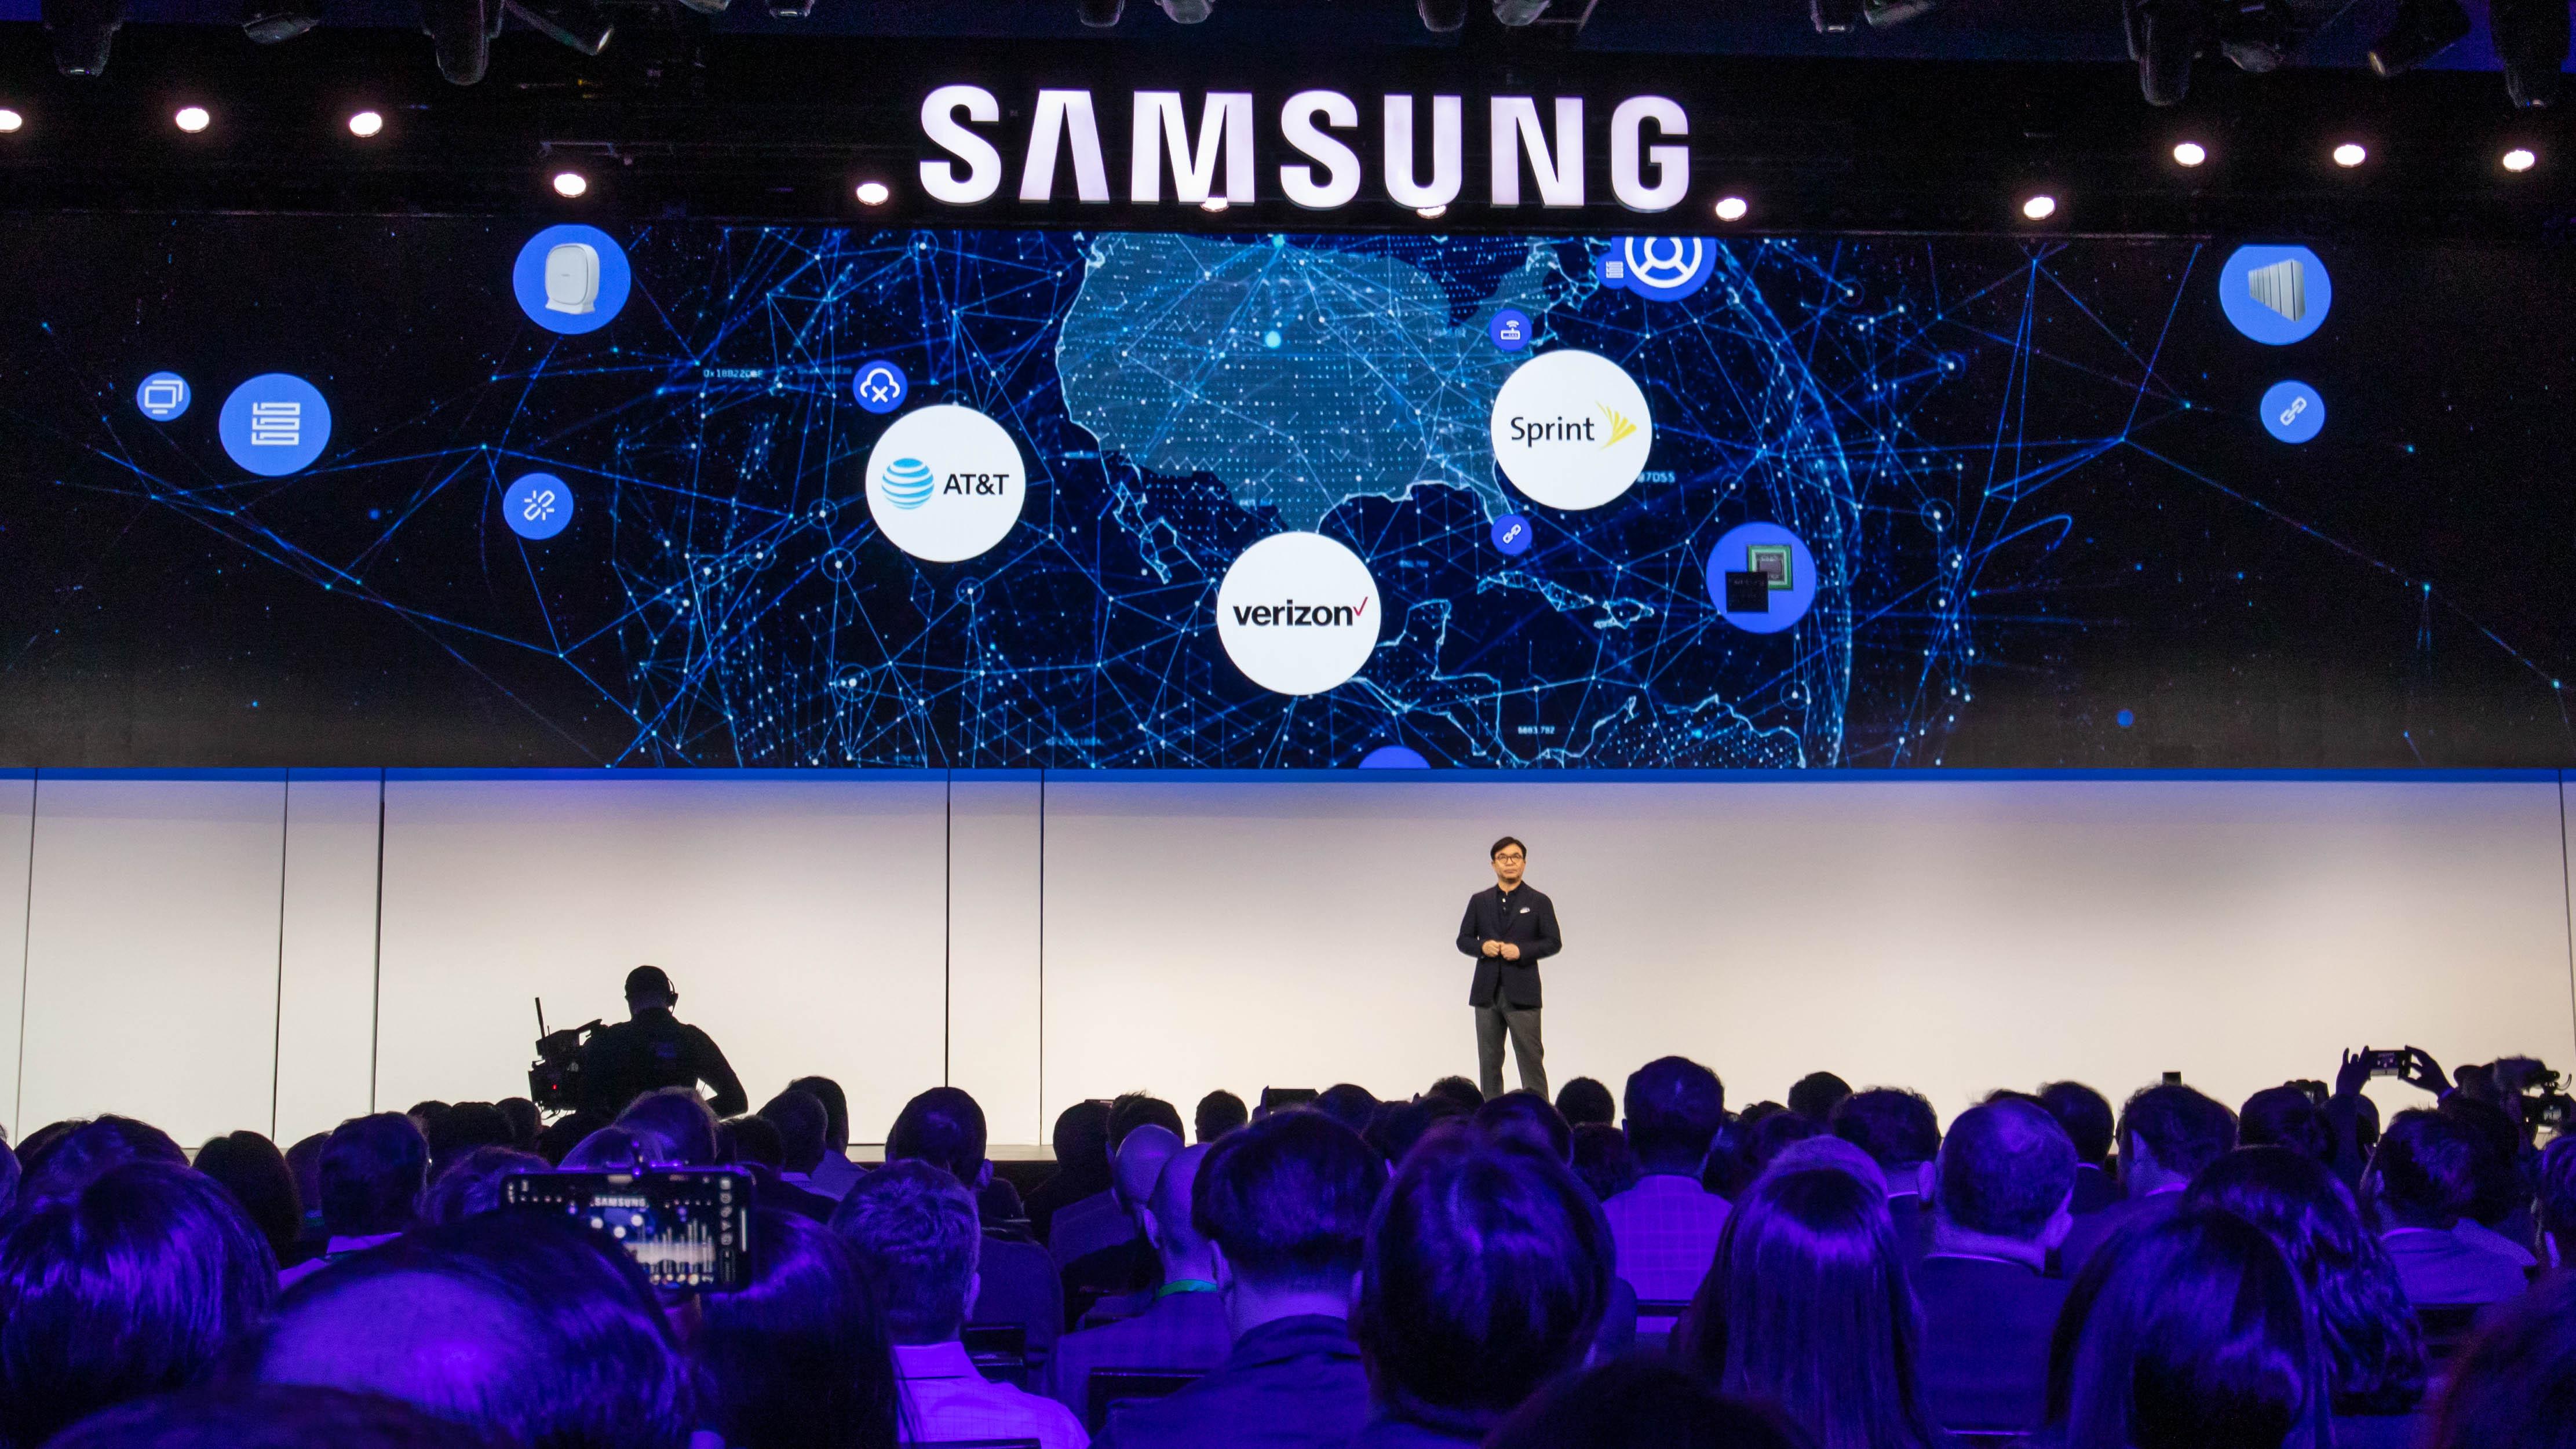 Samsung Galaxy S10 5G Diluncurkan Pada Musim Panas 2019,spesifikasi Samsung Galaxy S10 5G,kelebihan Samsung Galaxy S10 5G,kekurangan Samsung Galaxy S10 5G,kelebihan dan kekurangan Samsung Galaxy S10 5G,Samsung Galaxy S10 5G,harga Samsung Galaxy S10 5G, smartphone 5G terbaru,smartphone 5G samsung